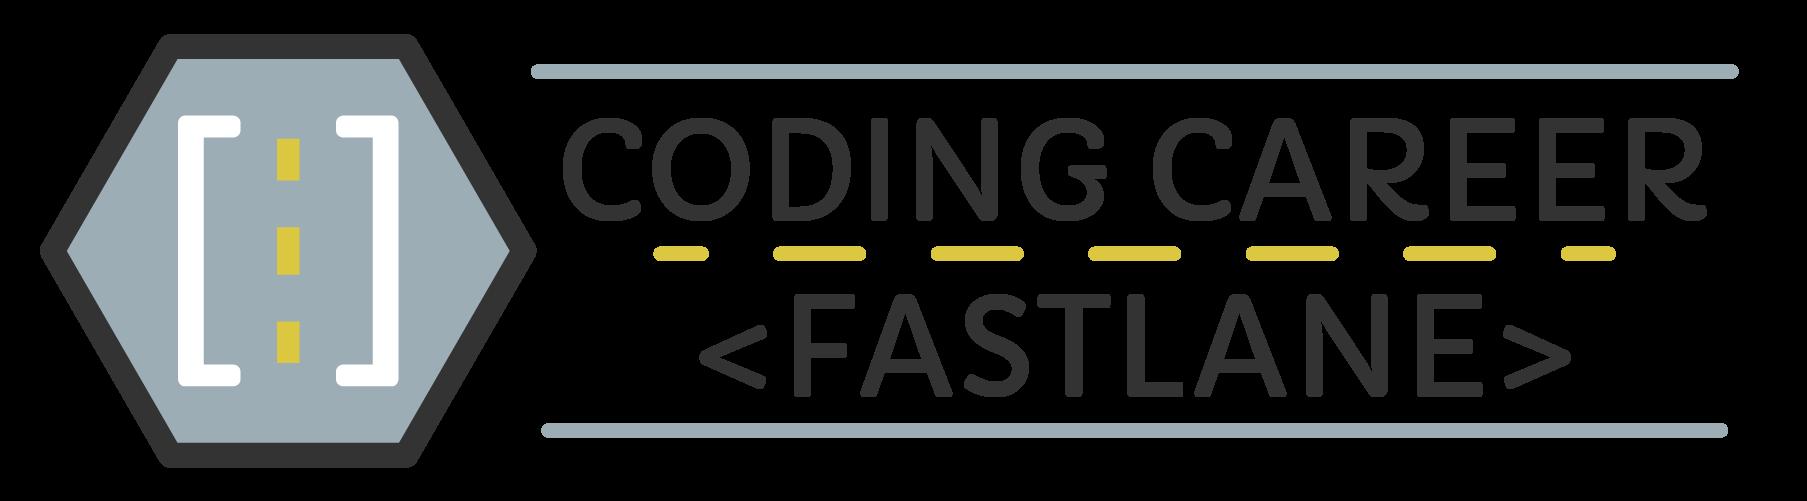 Coding Career FastLane